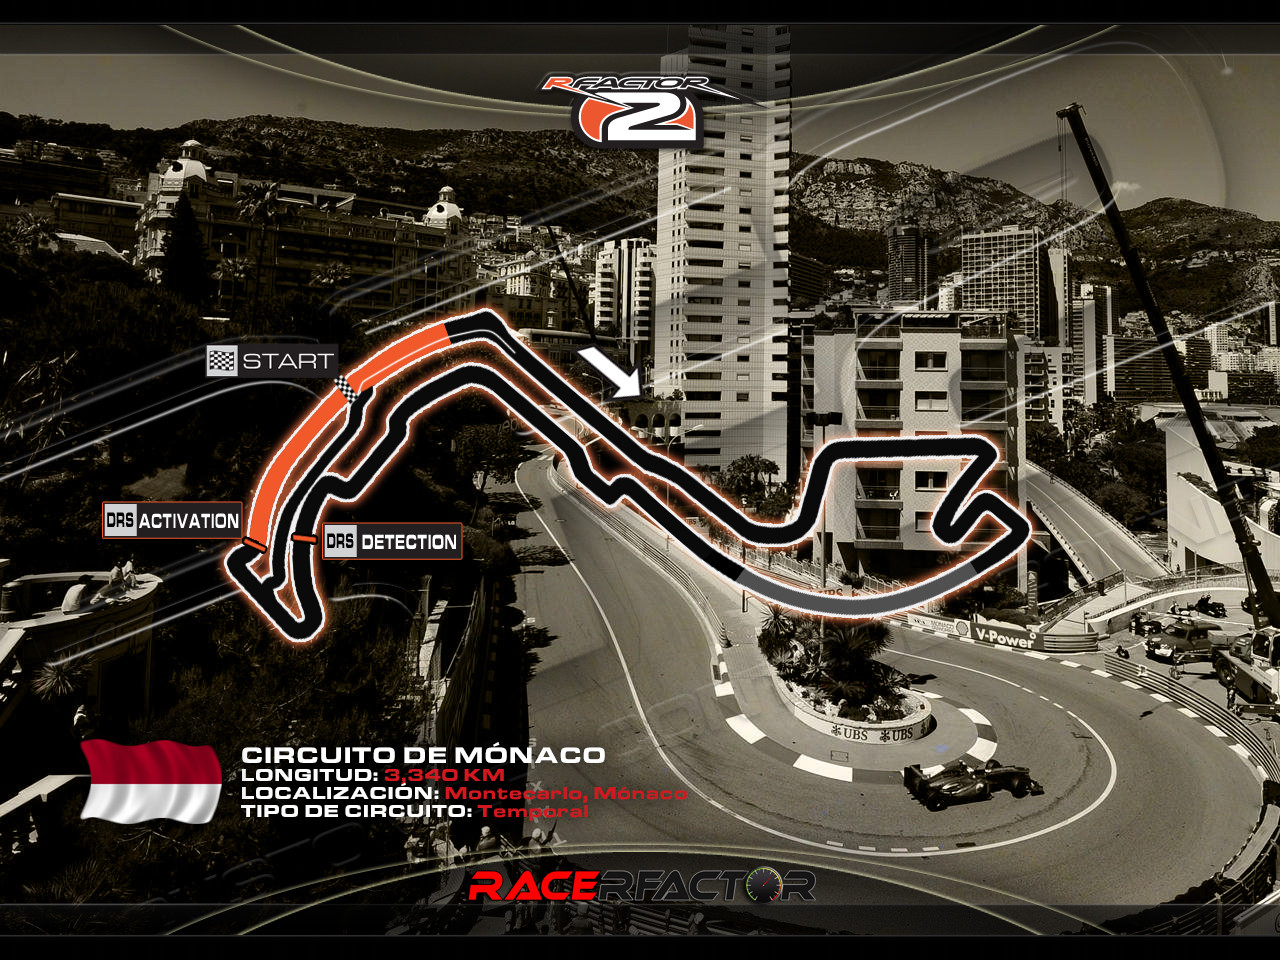 Circuito Monaco : Racerfactor monaco